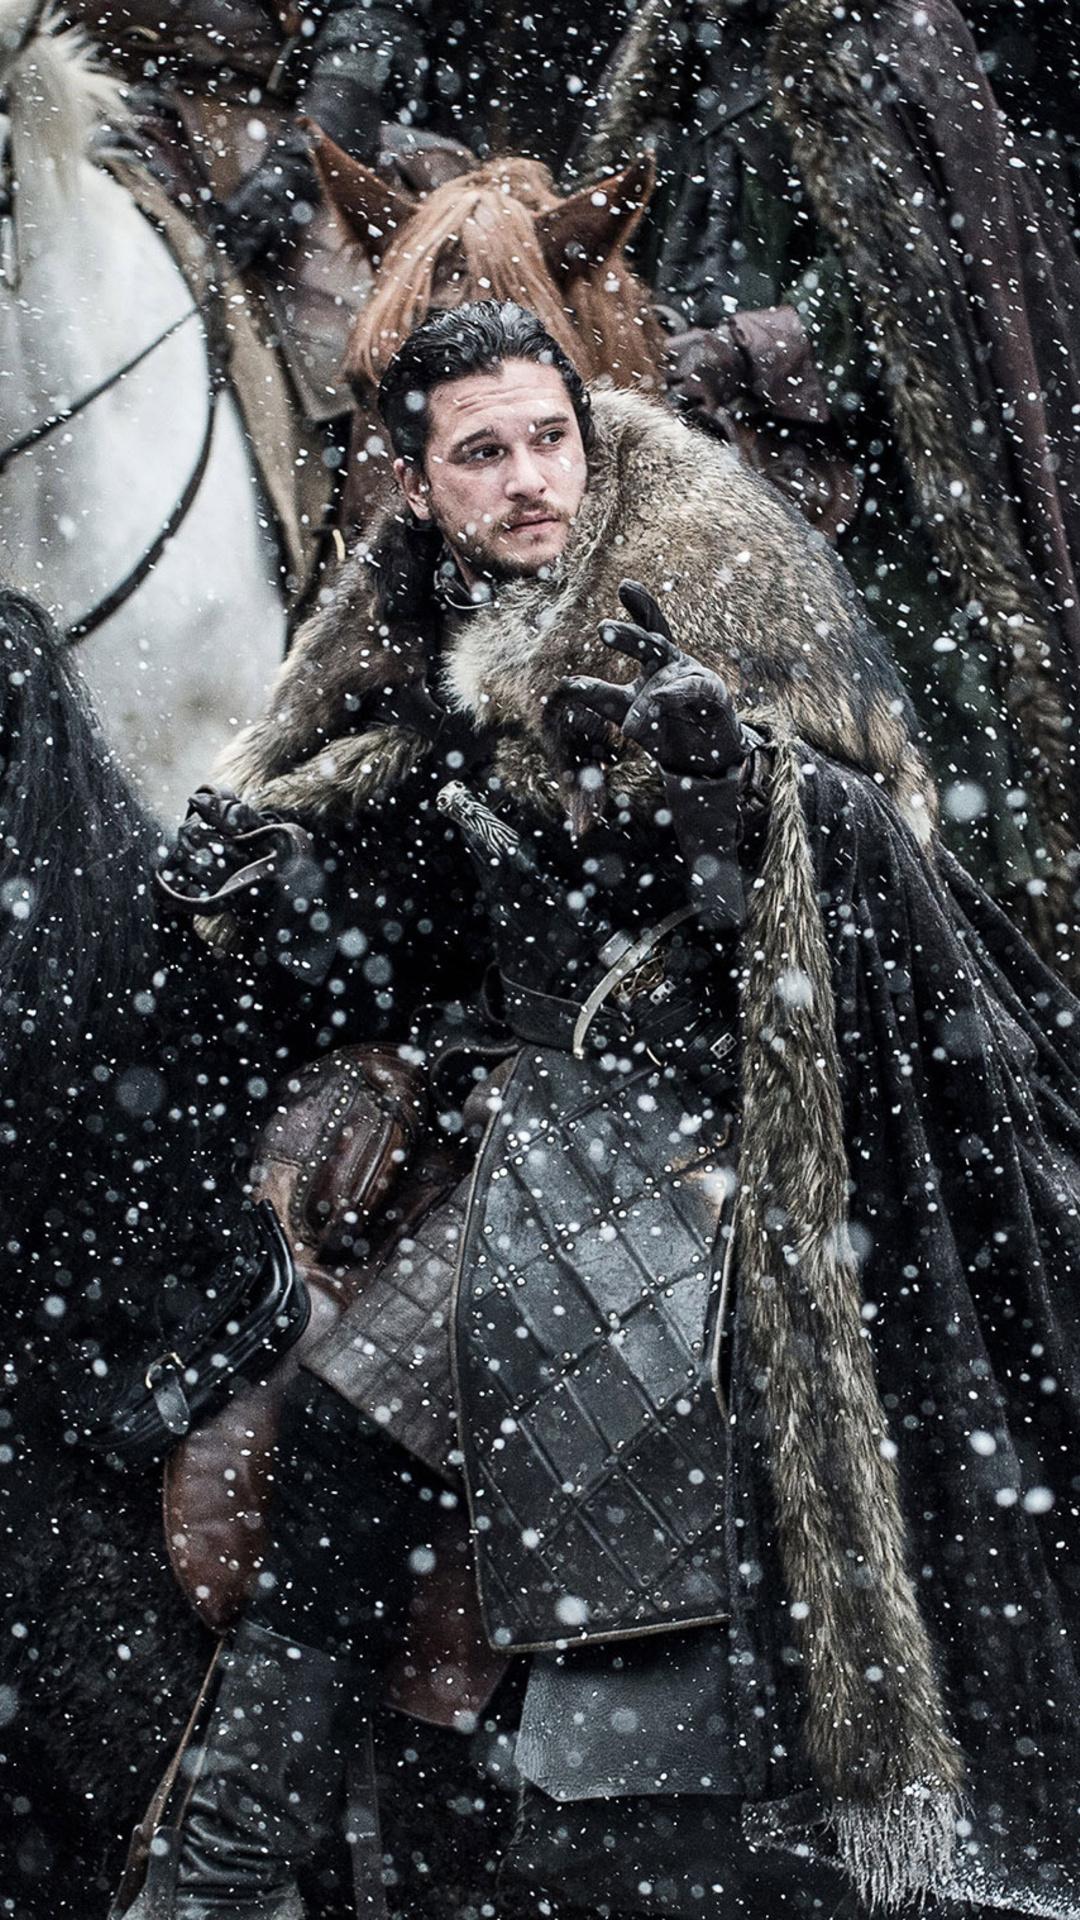 1080x1920 Jon Snow Game Of Thrones Season 7 Iphone 7,6s,6 Plus, Pixel xl ,One Plus 3,3t,5 HD 4k